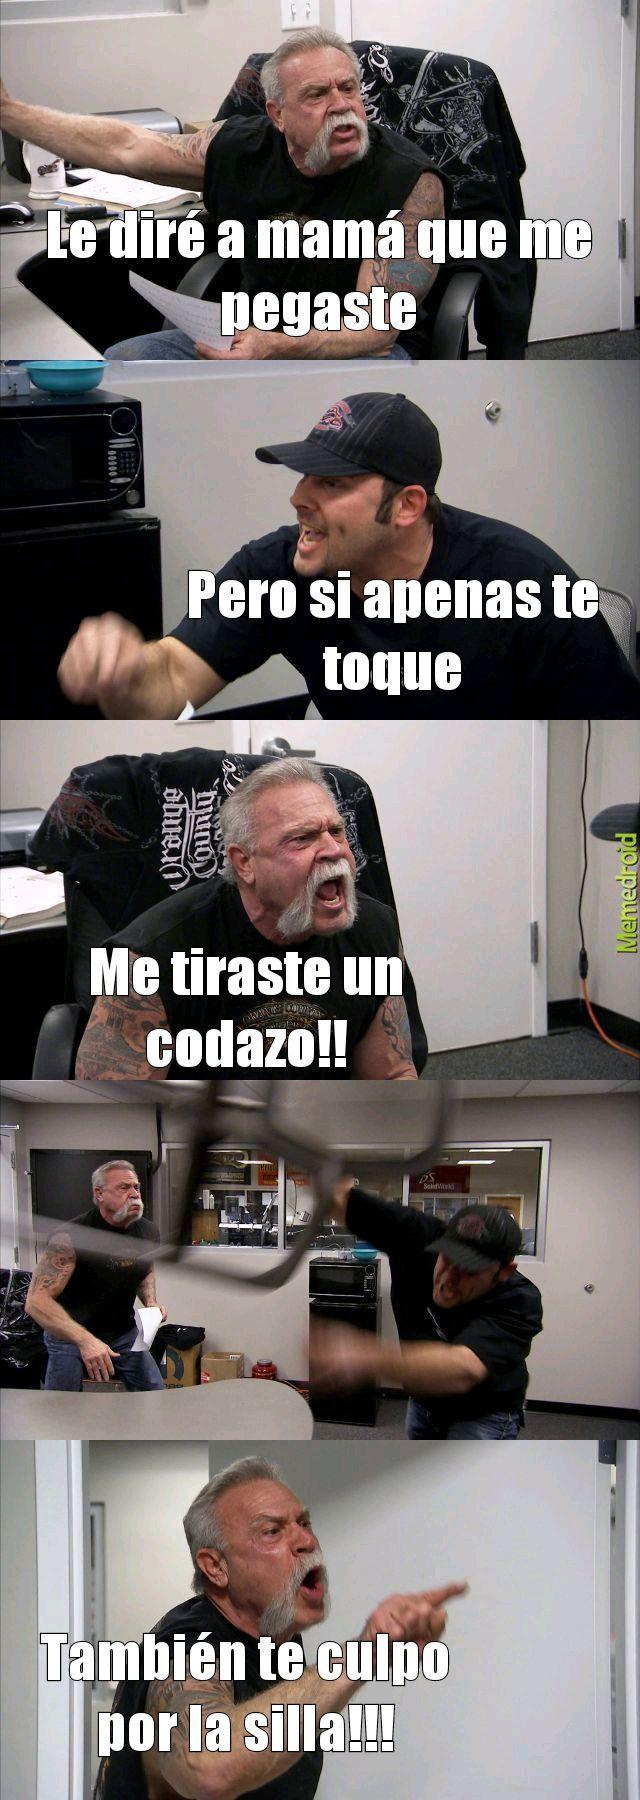 Hermanos :) - meme